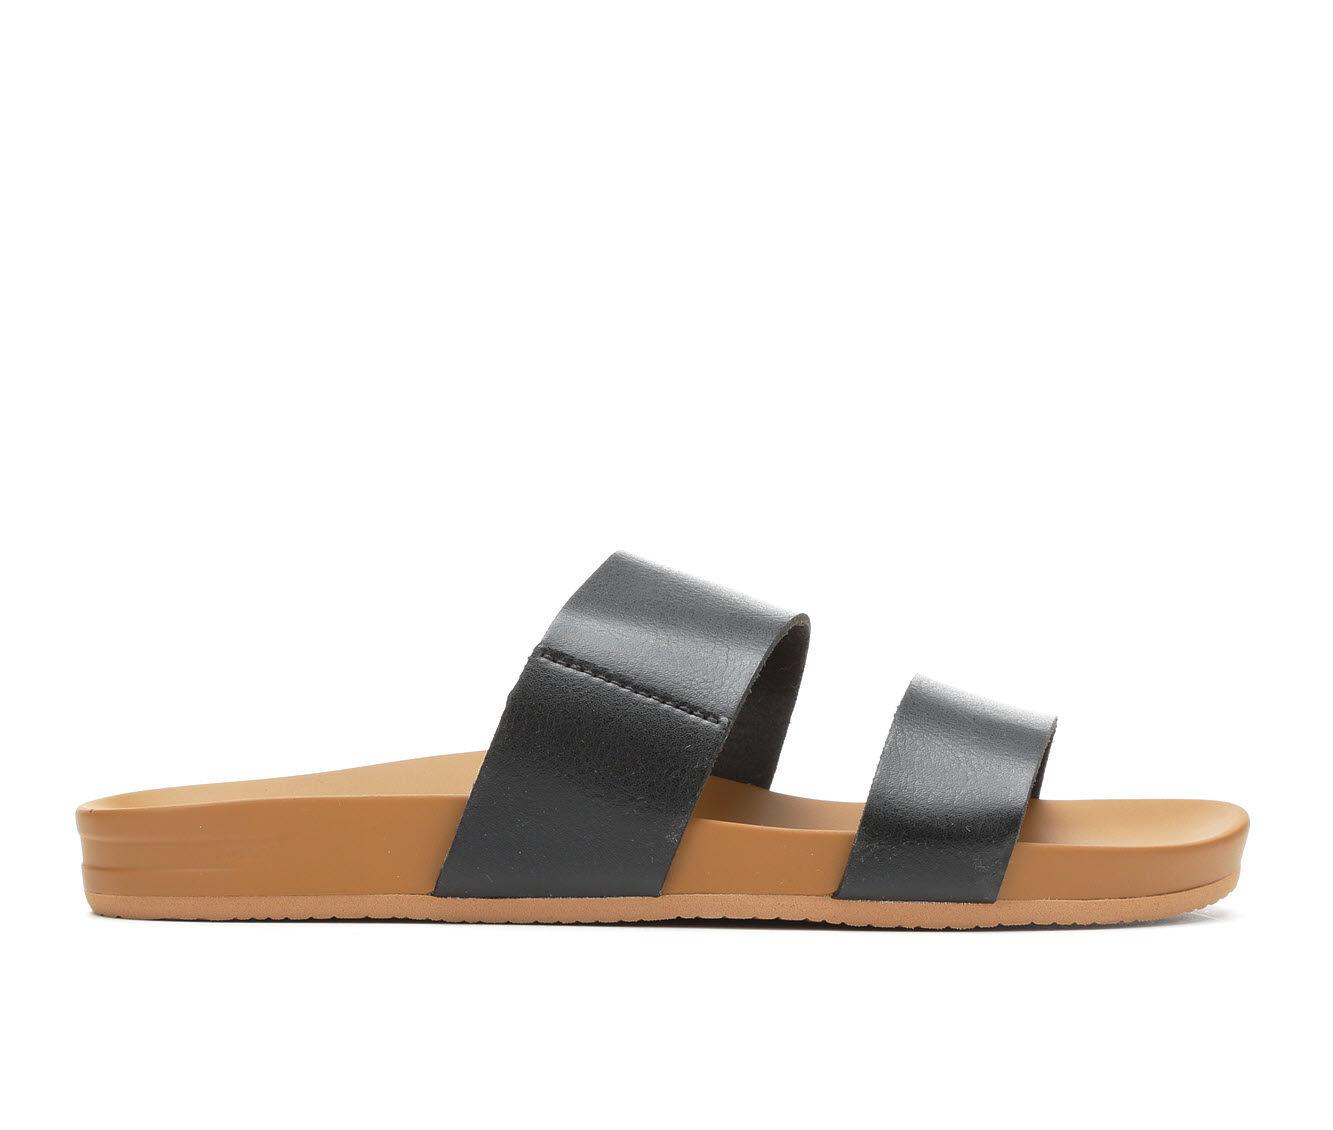 Affordable Women's Reef Cushion Bounce Vista Sandals Black/Natural